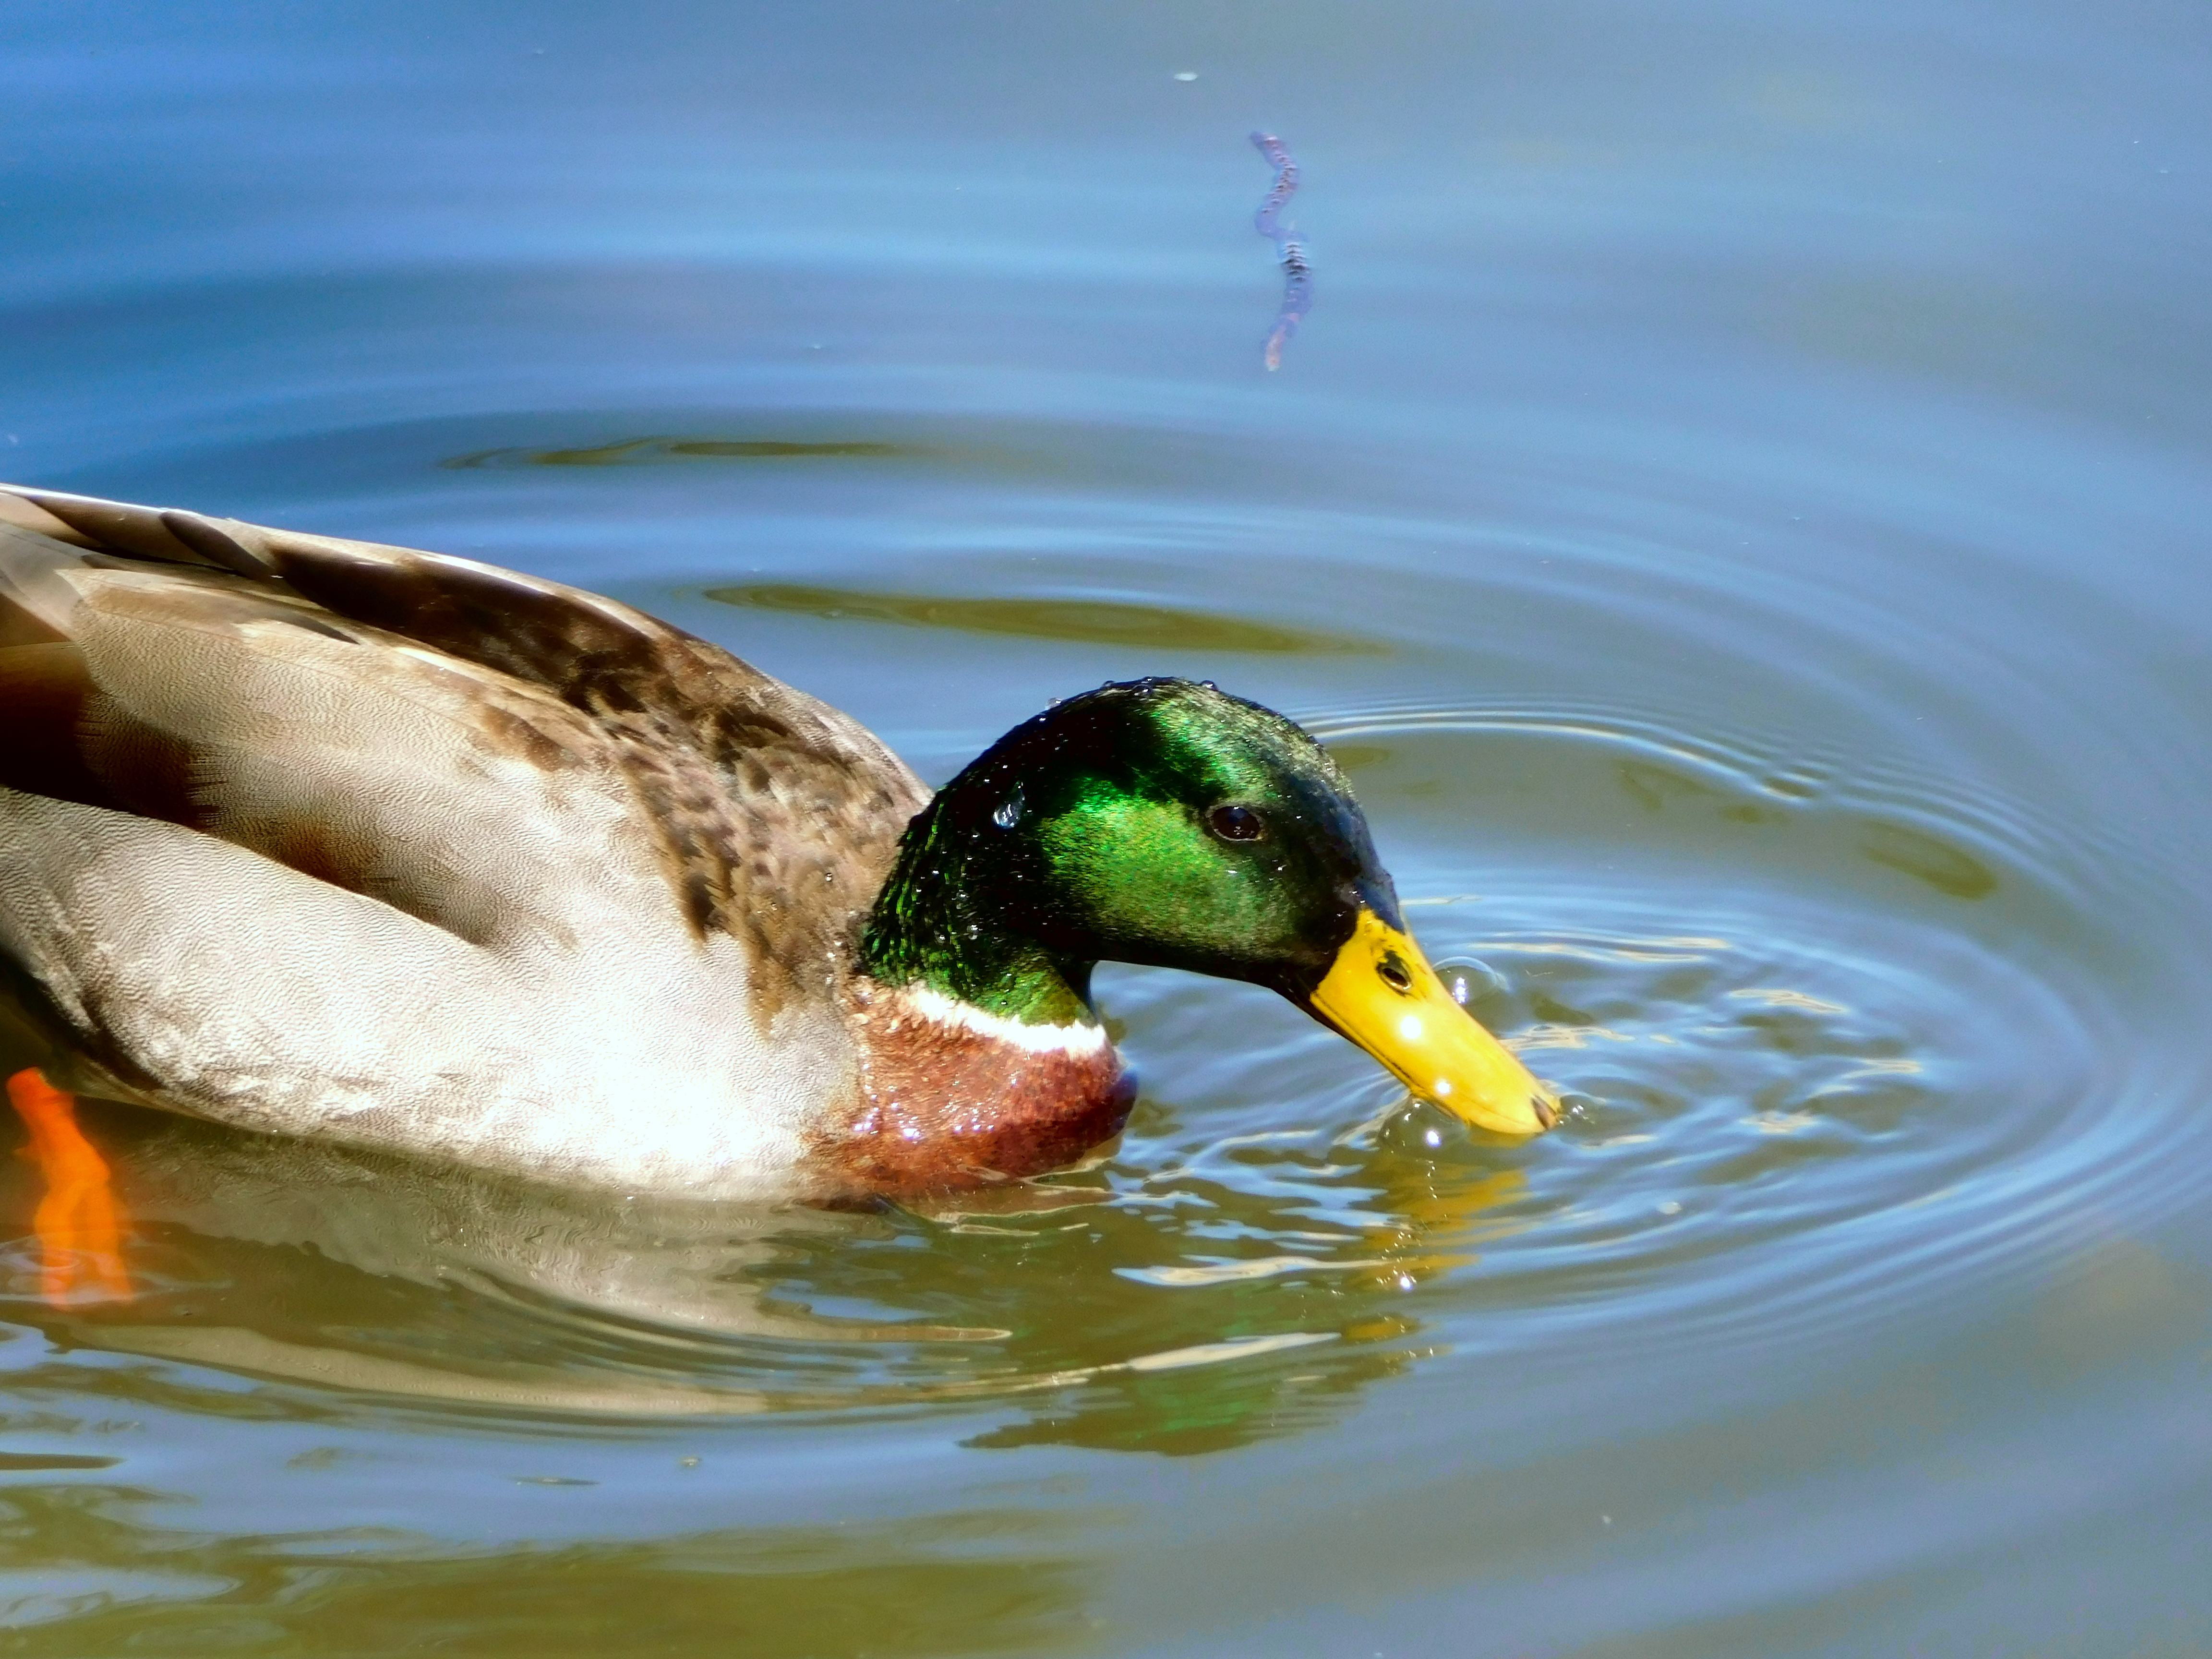 Male Mallard in a pond